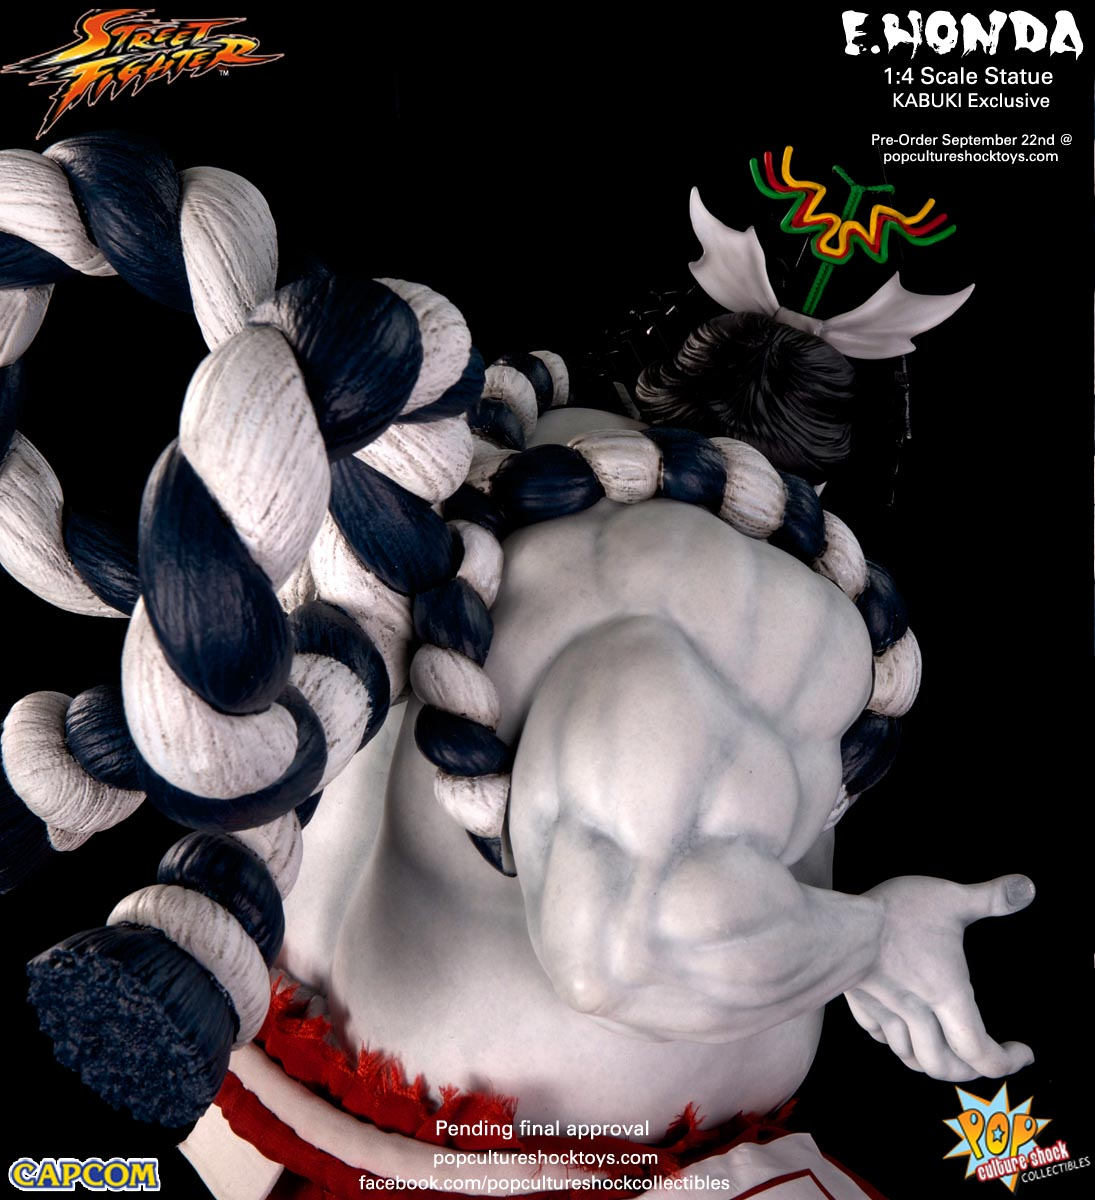 [Pop Culture Shock] Street Fighter: E. Honda 1/4 Statue - Página 3 Street-Fighter-E.-Honda-Kabuki-Statue-023